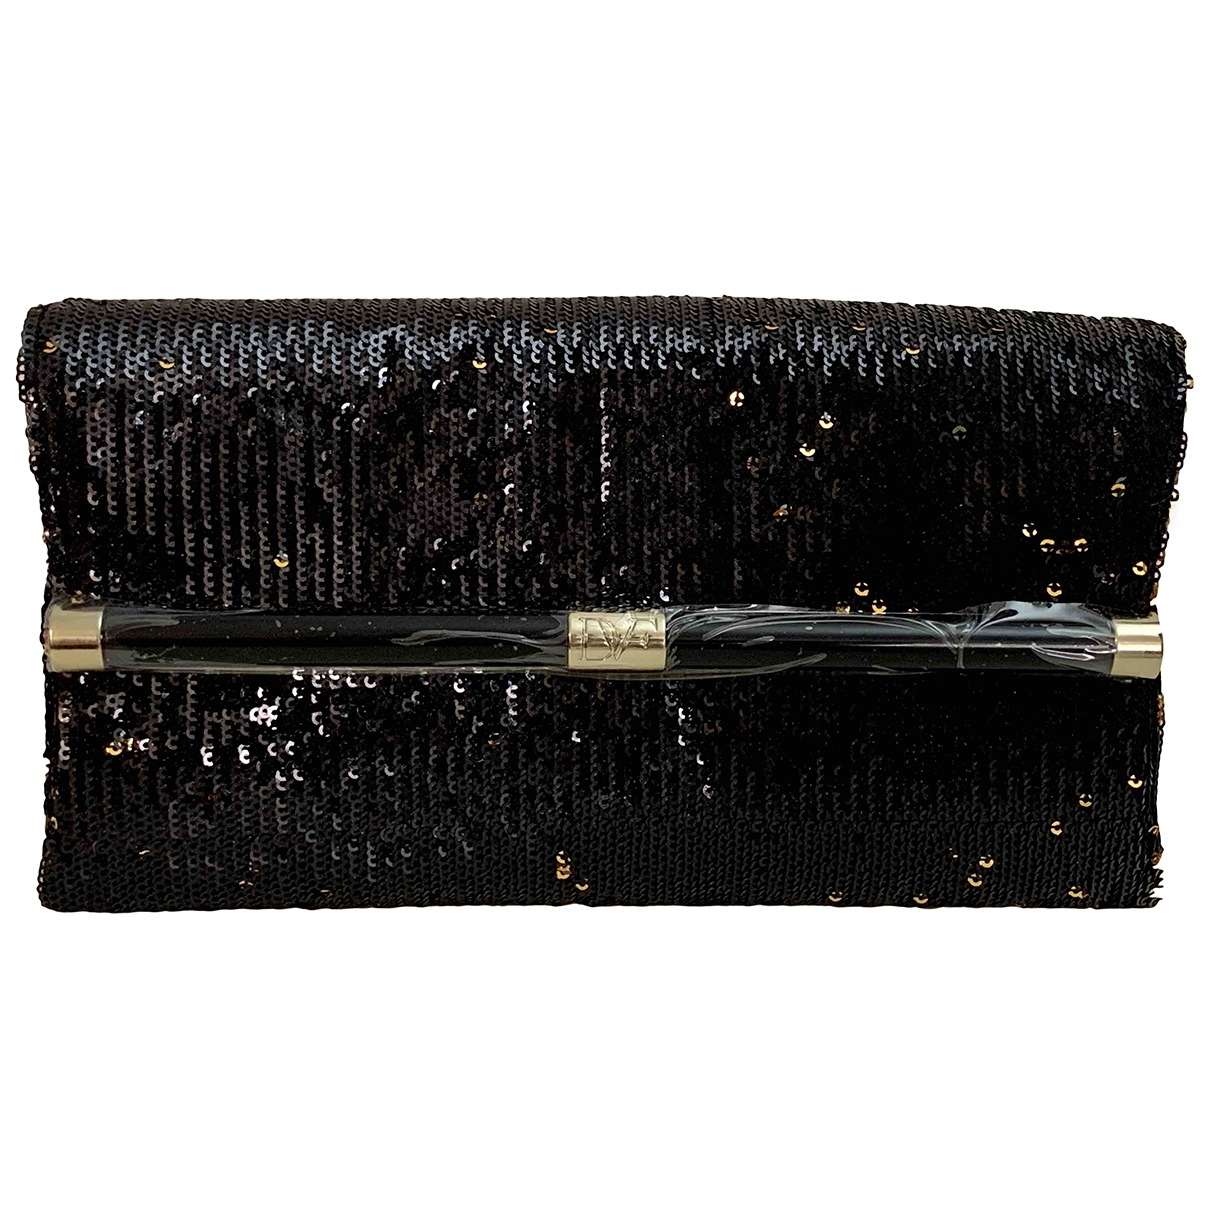 Diane Von Furstenberg \N Black Leather Clutch bag for Women \N